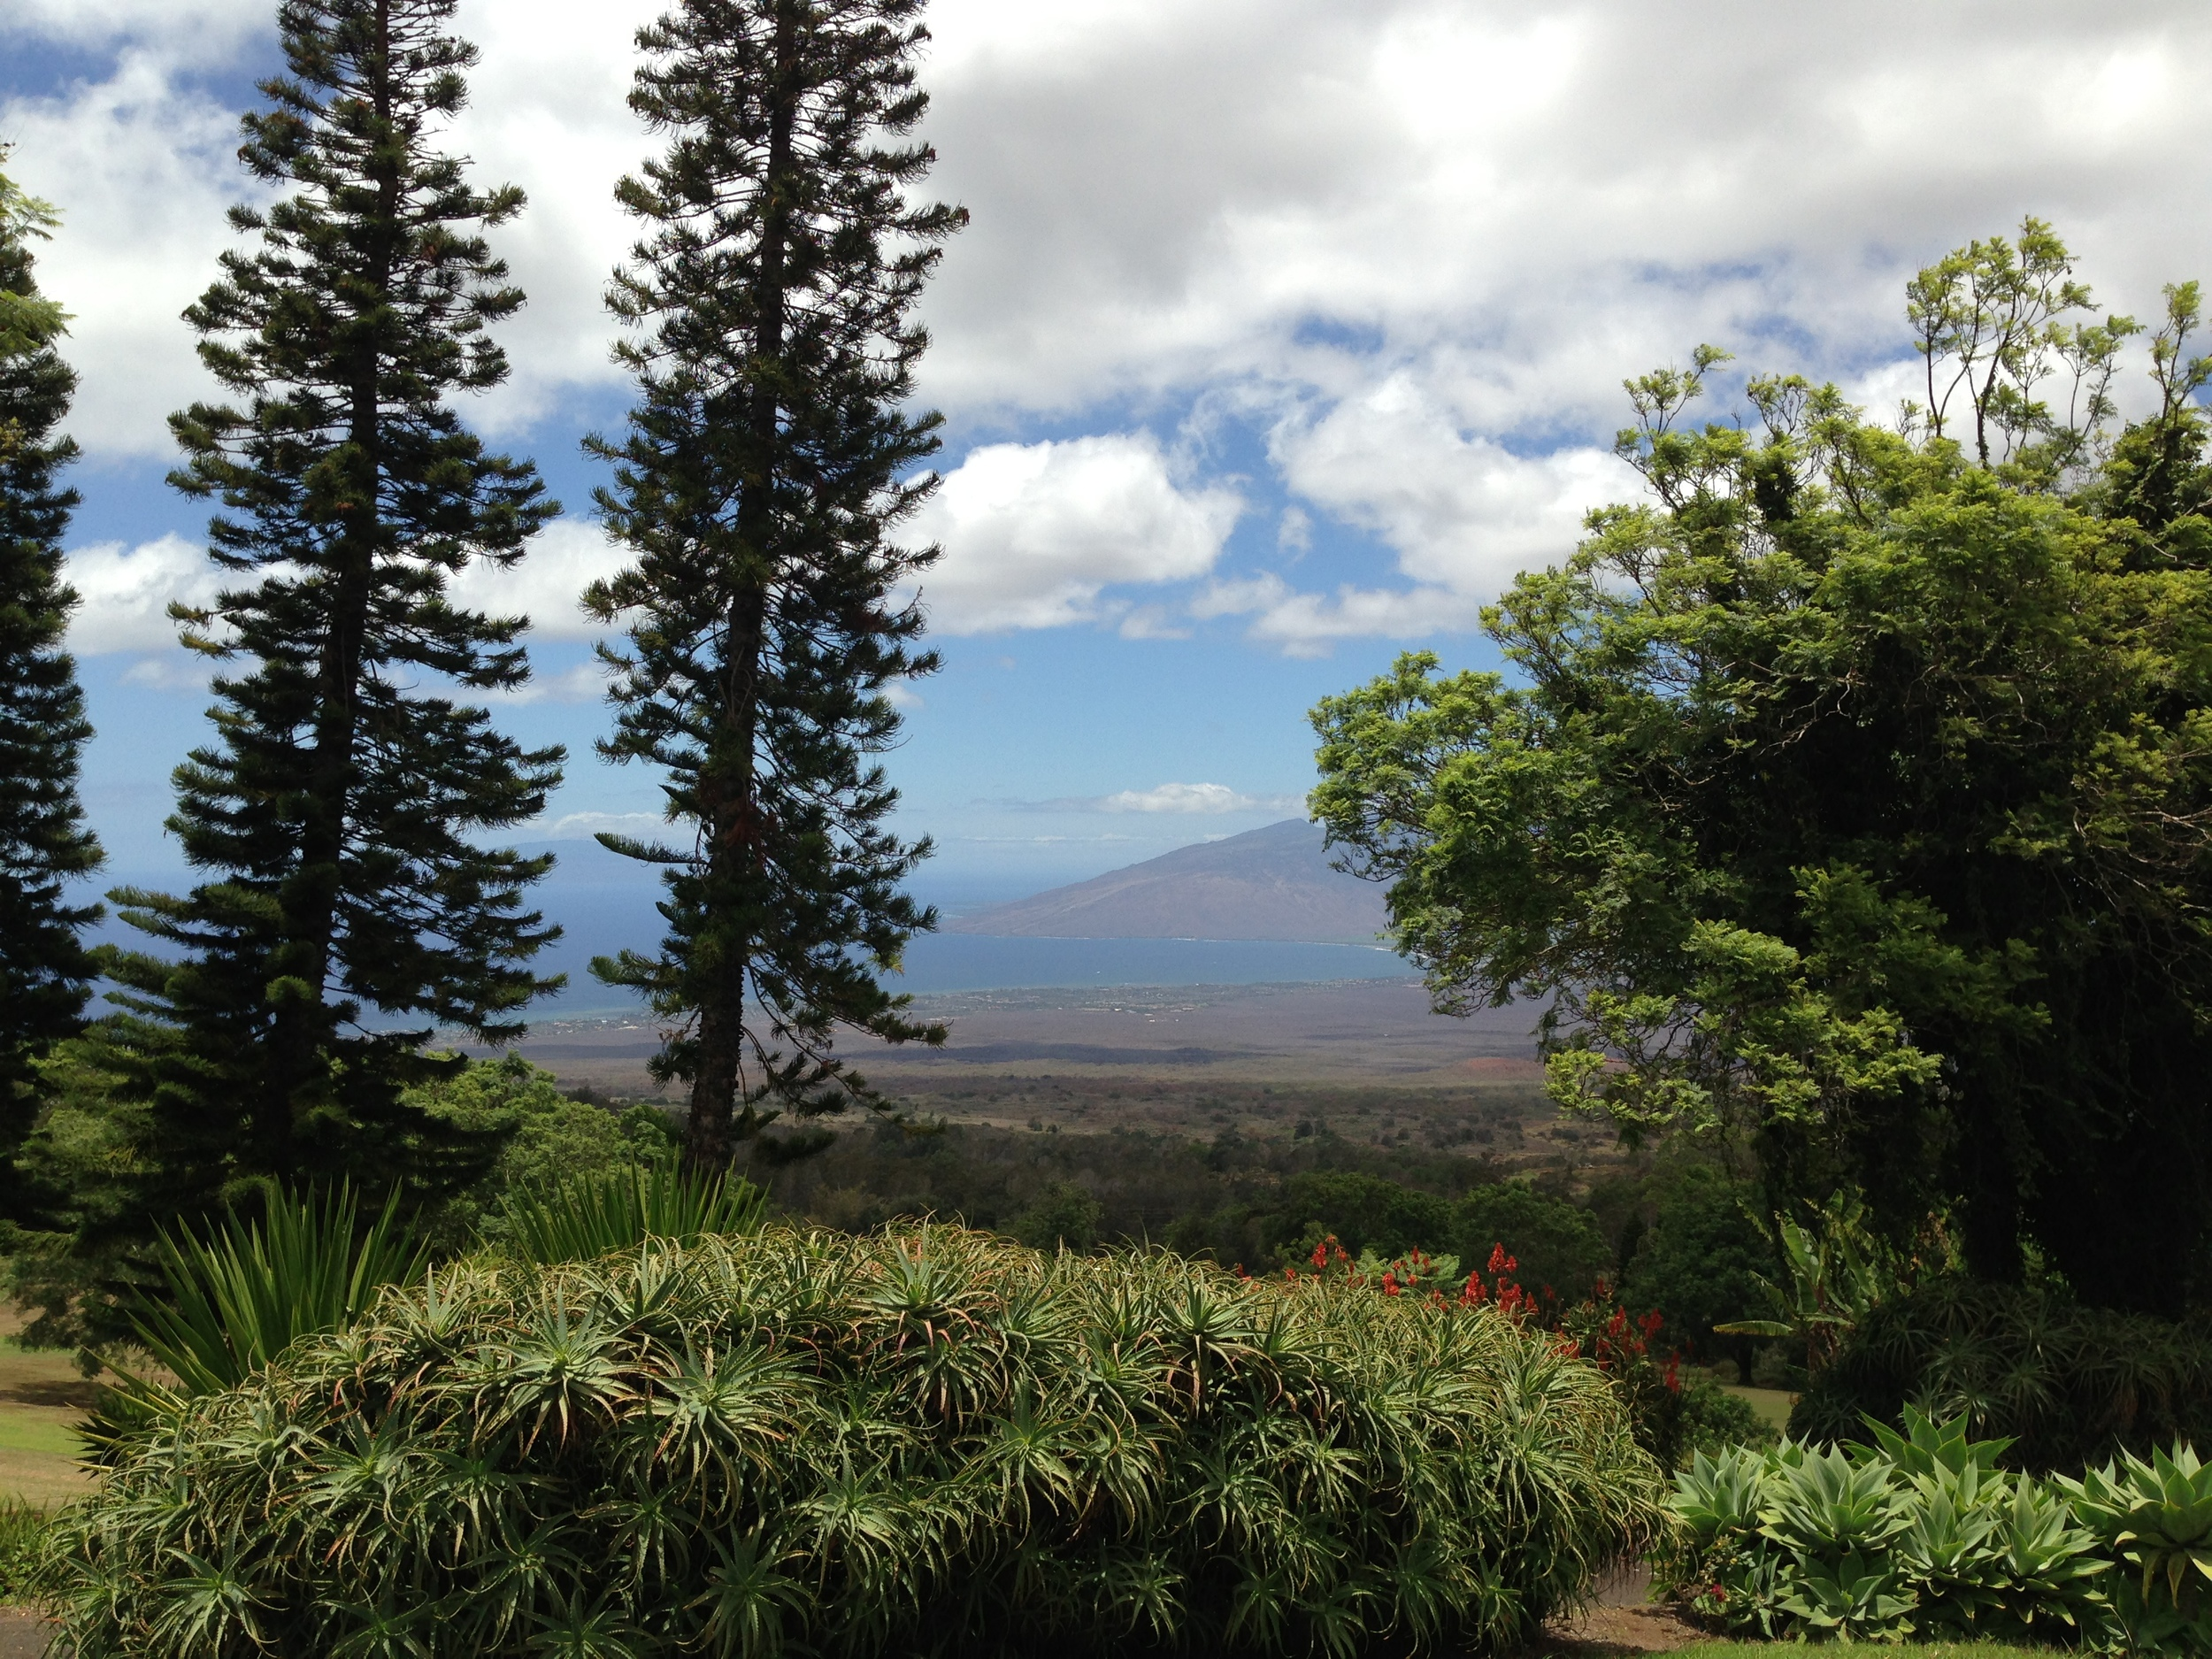 The view from St. John's Church, Kula